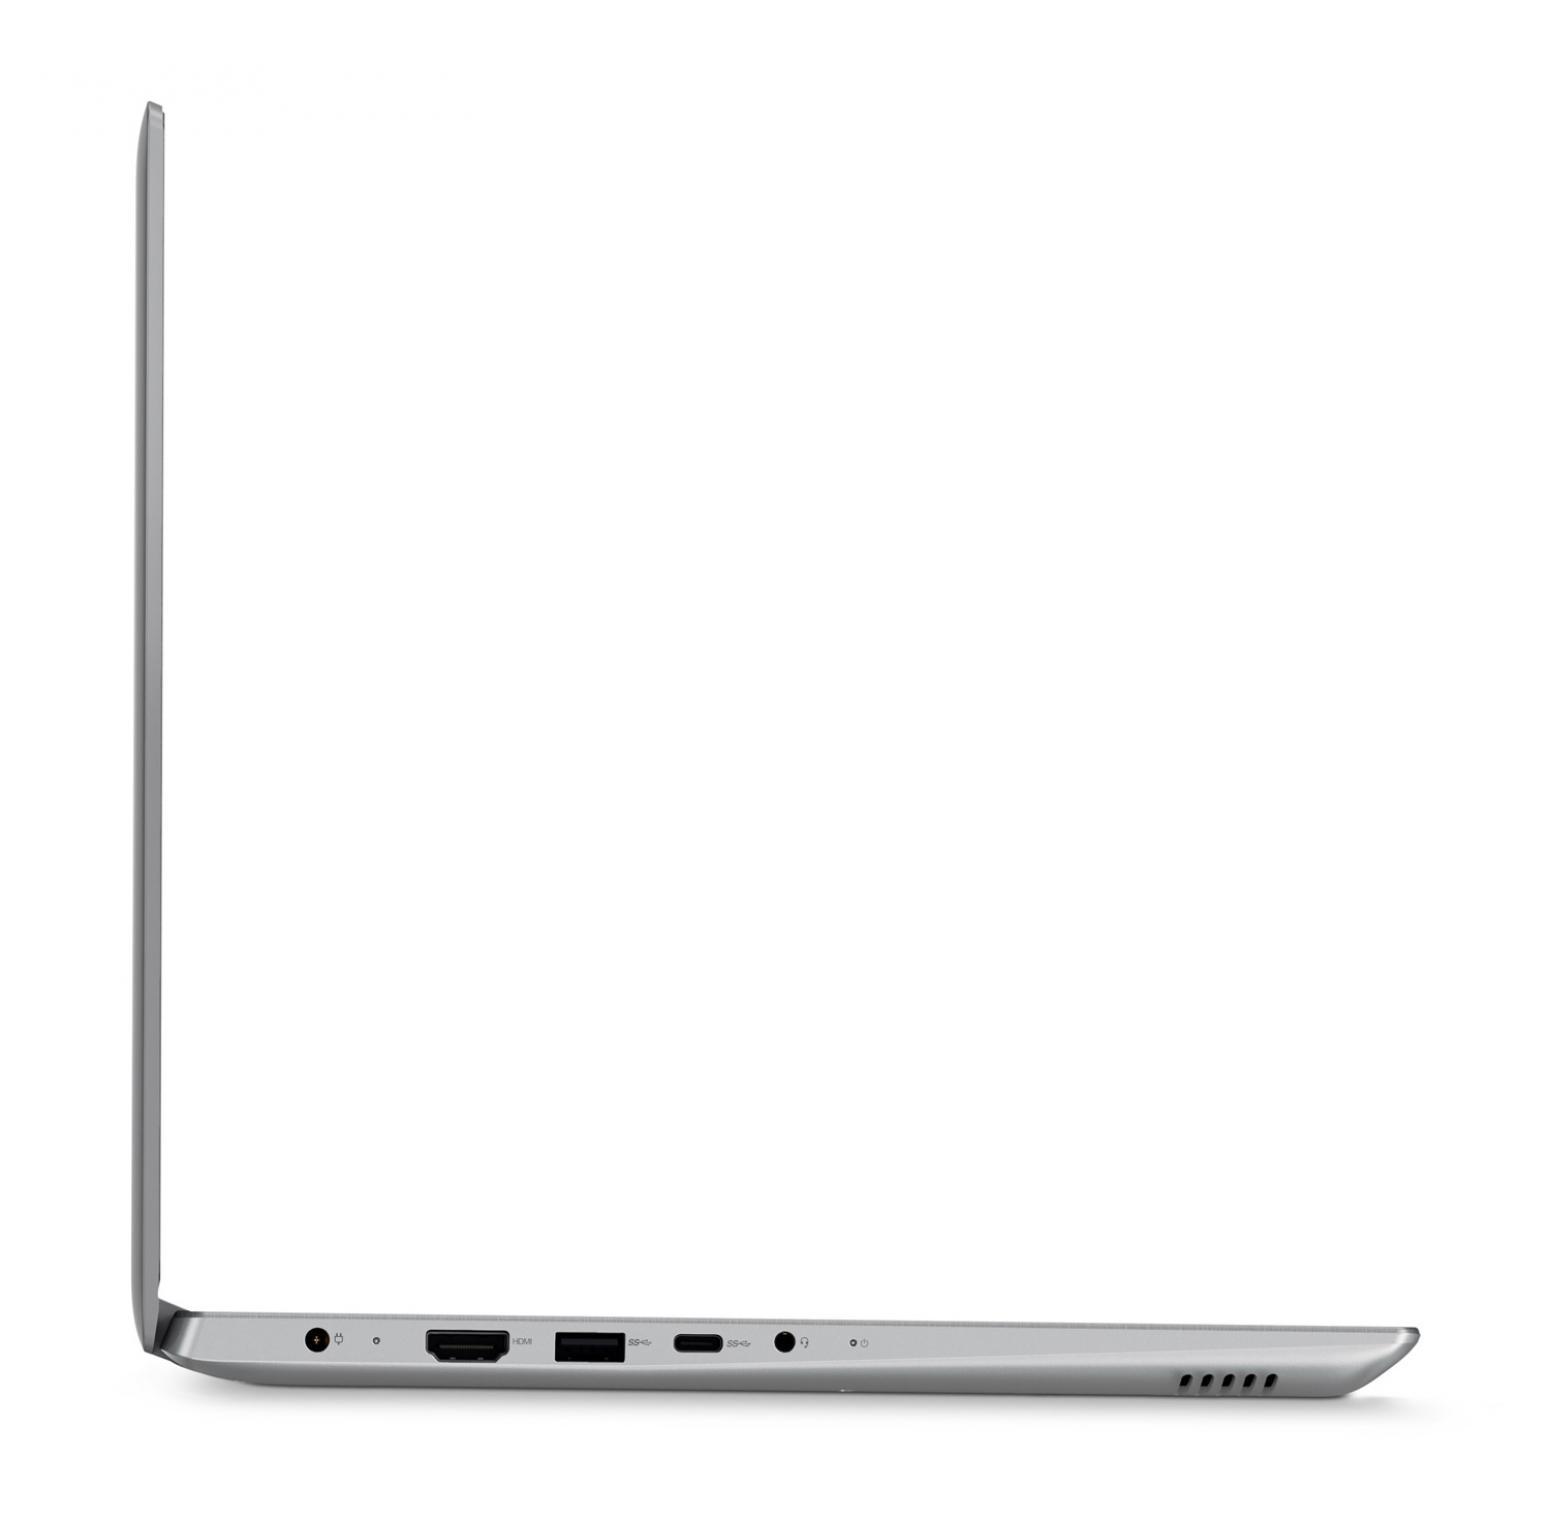 Ordinateur portable Lenovo IdeaPad 320S-14IKBR (81BN004NFR) Argent - Full HD Refresh - photo 7